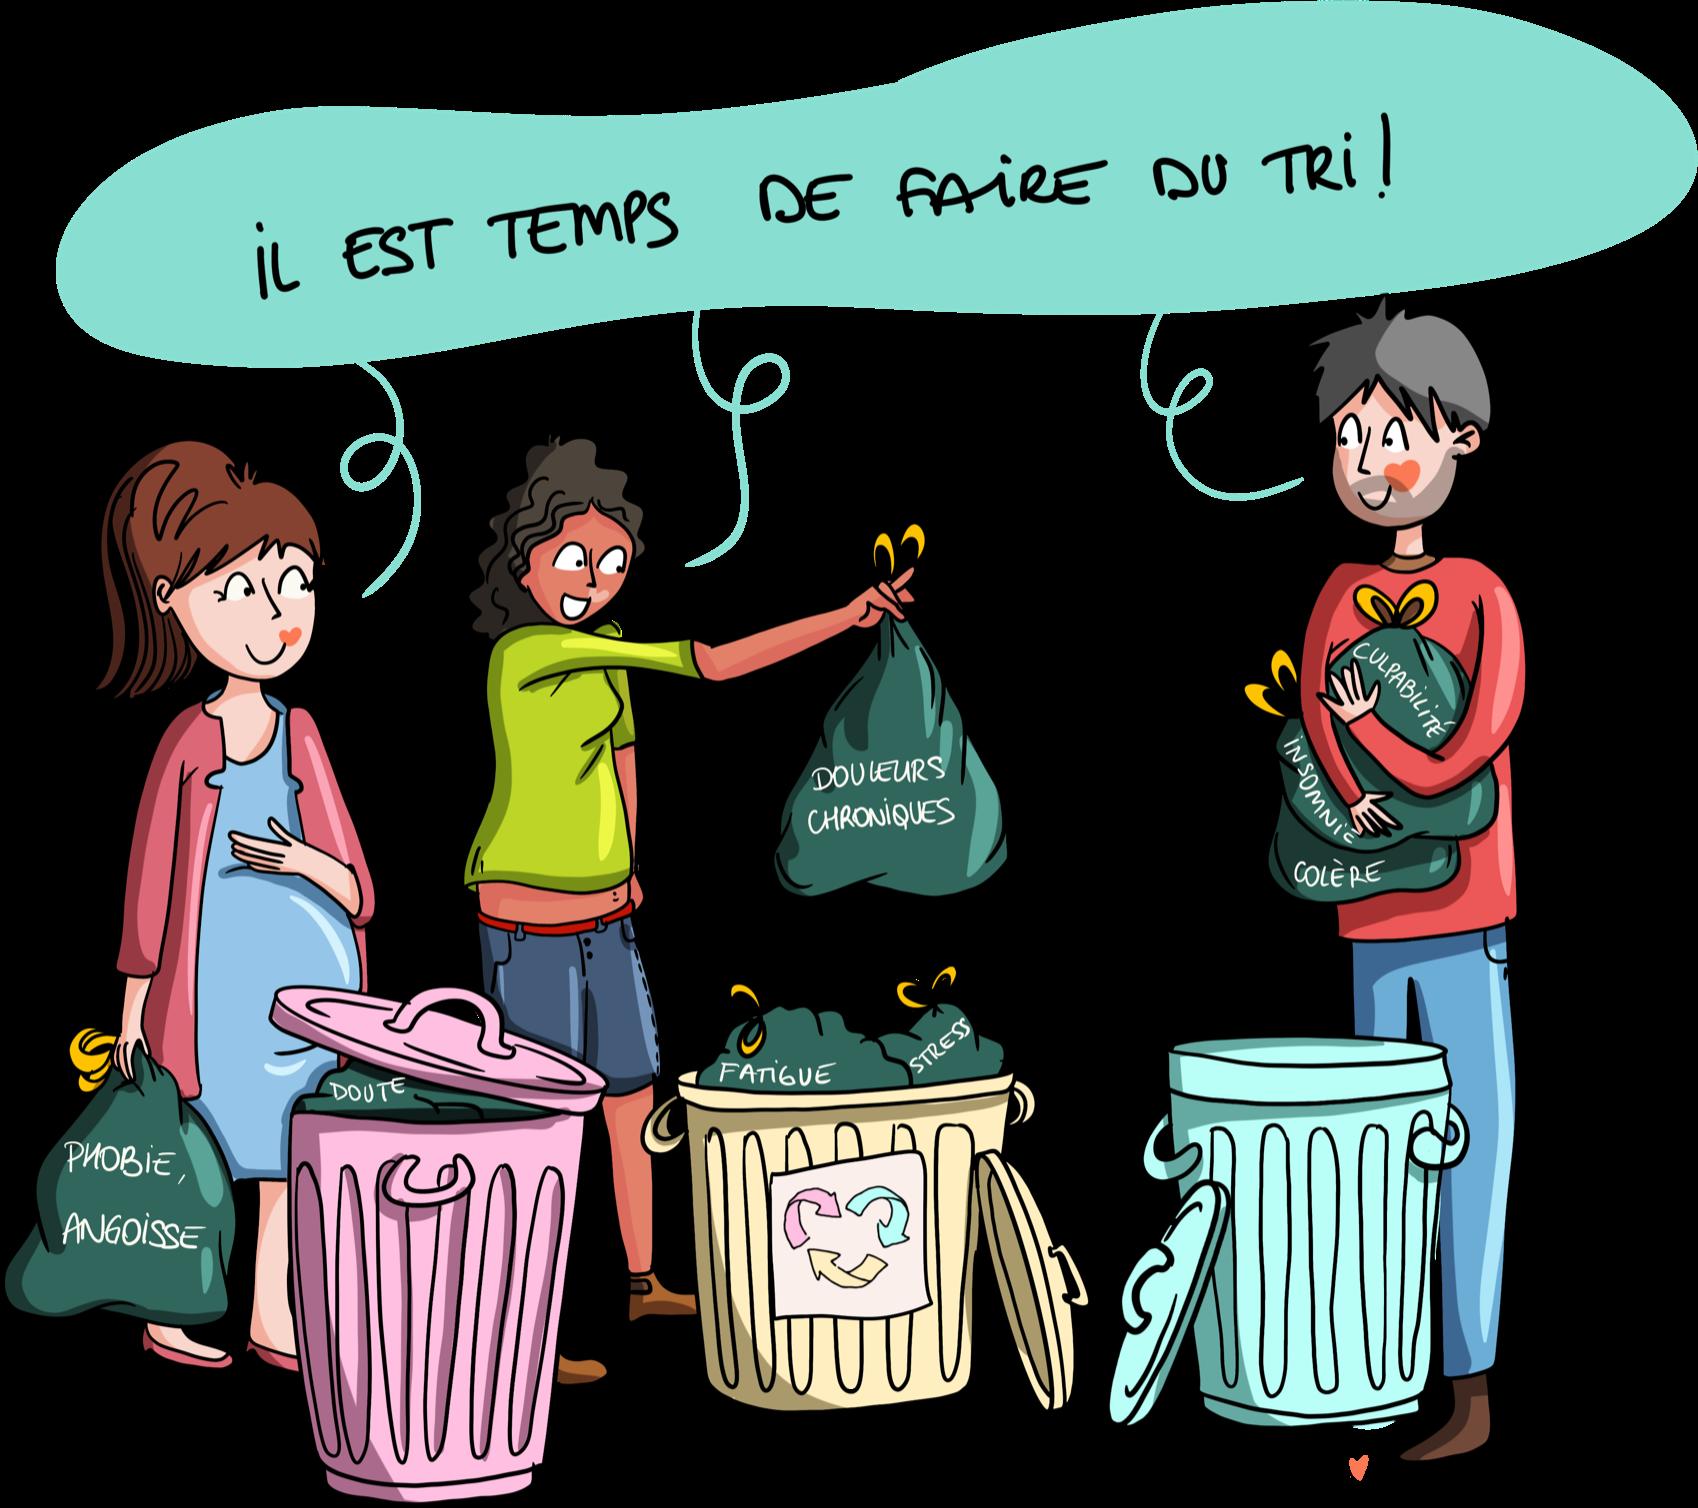 La recycle positive